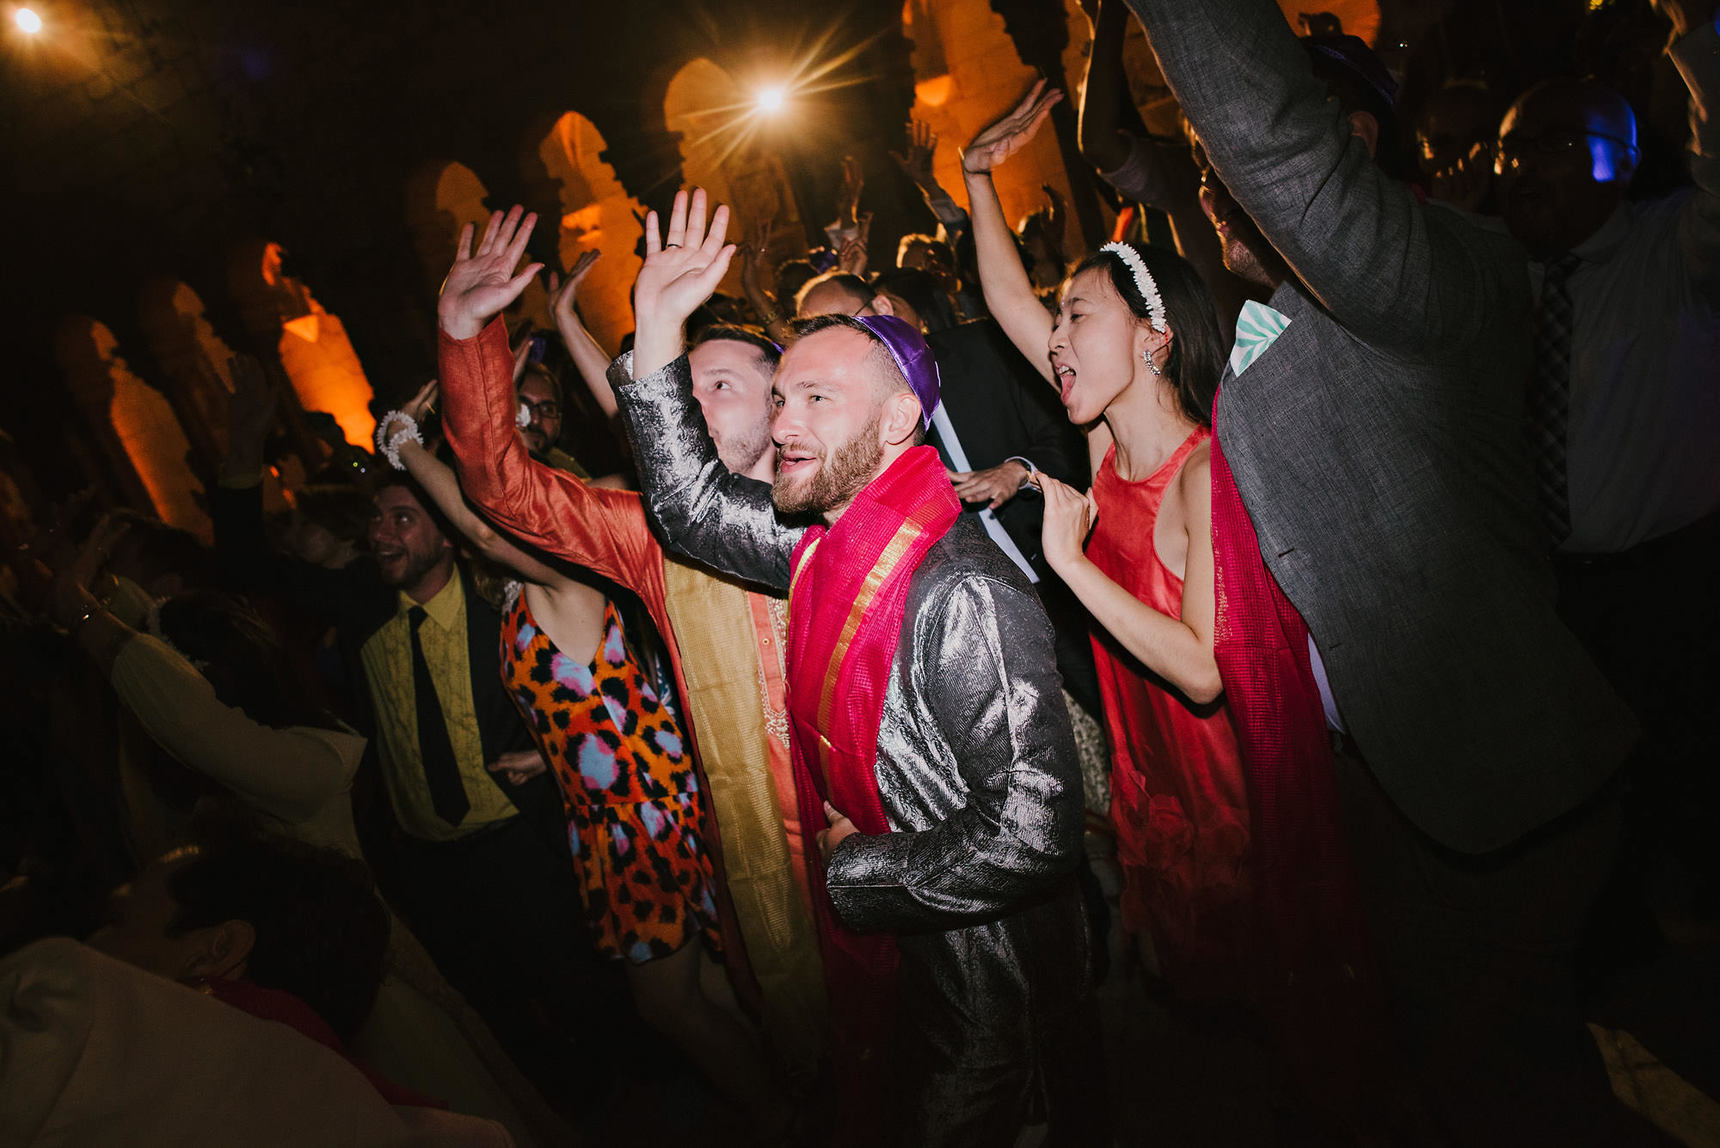 miami-luxury-catering-Wedding-Photography-95(pp_w1720_h1148).jpg